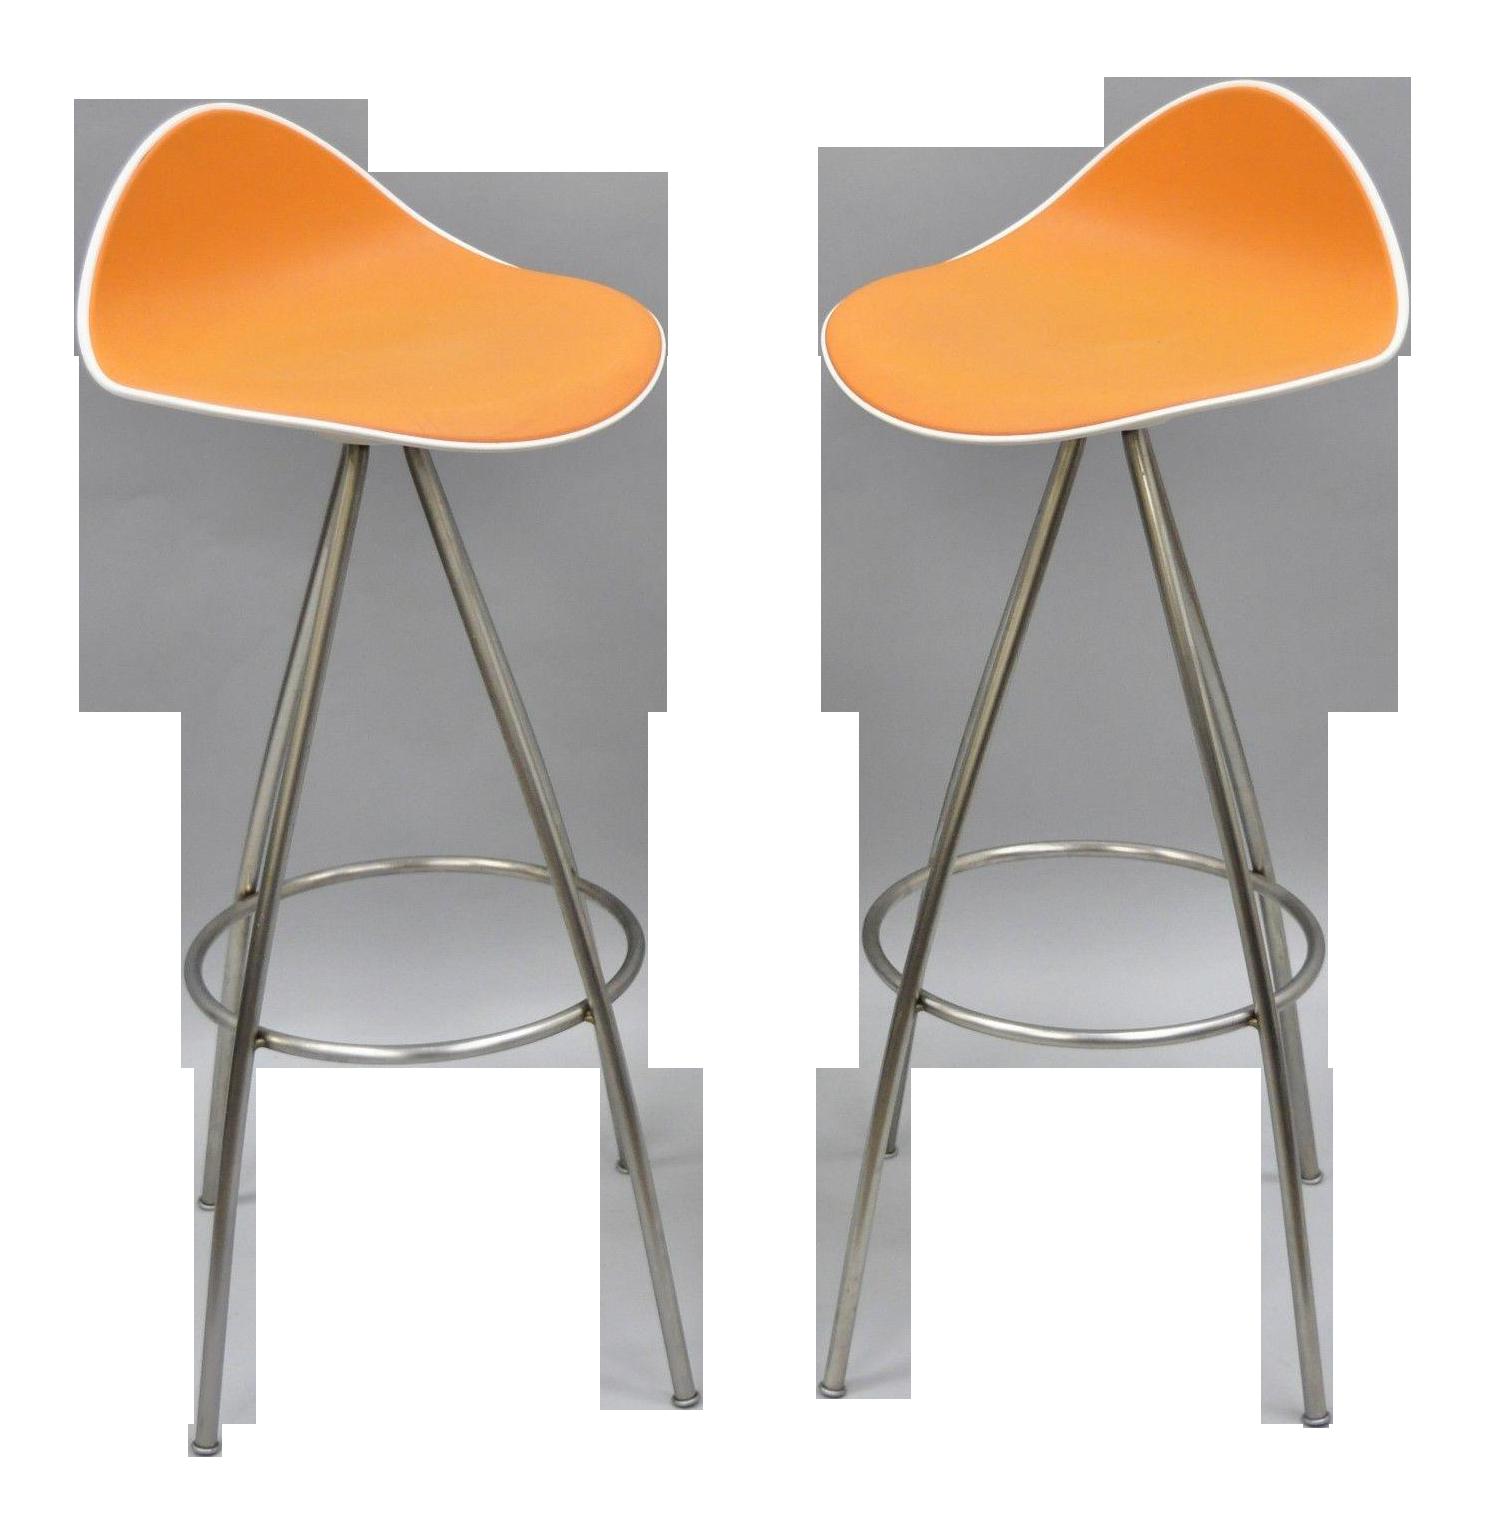 Onda Orange Rubber U0026 Steel Metal Barstools  A Pair 36 Bar Stools O6